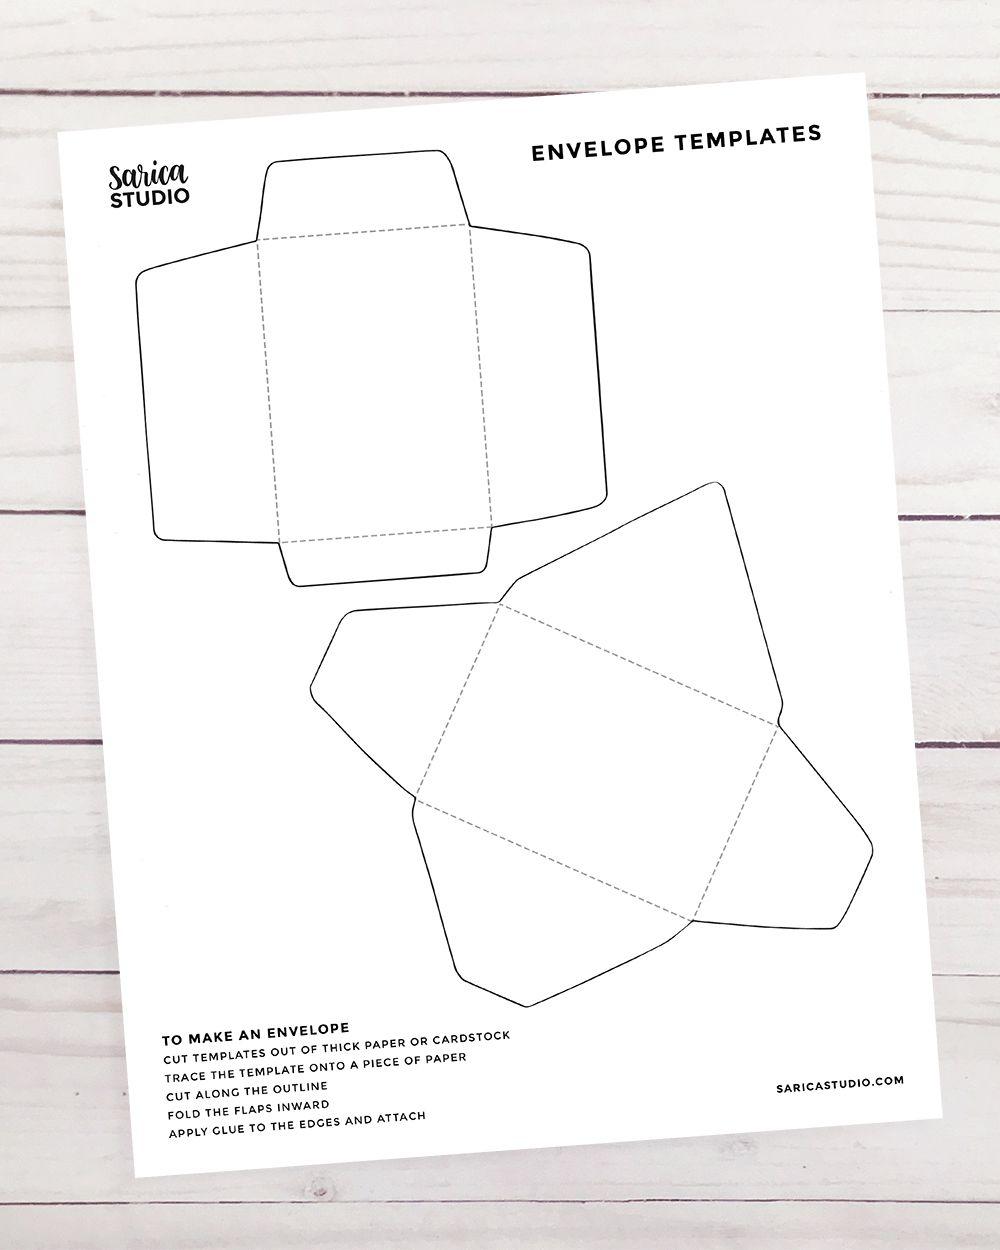 012 Frightening Gift Card Envelope Template Idea  Templates Voucher Diy Free PrintableFull